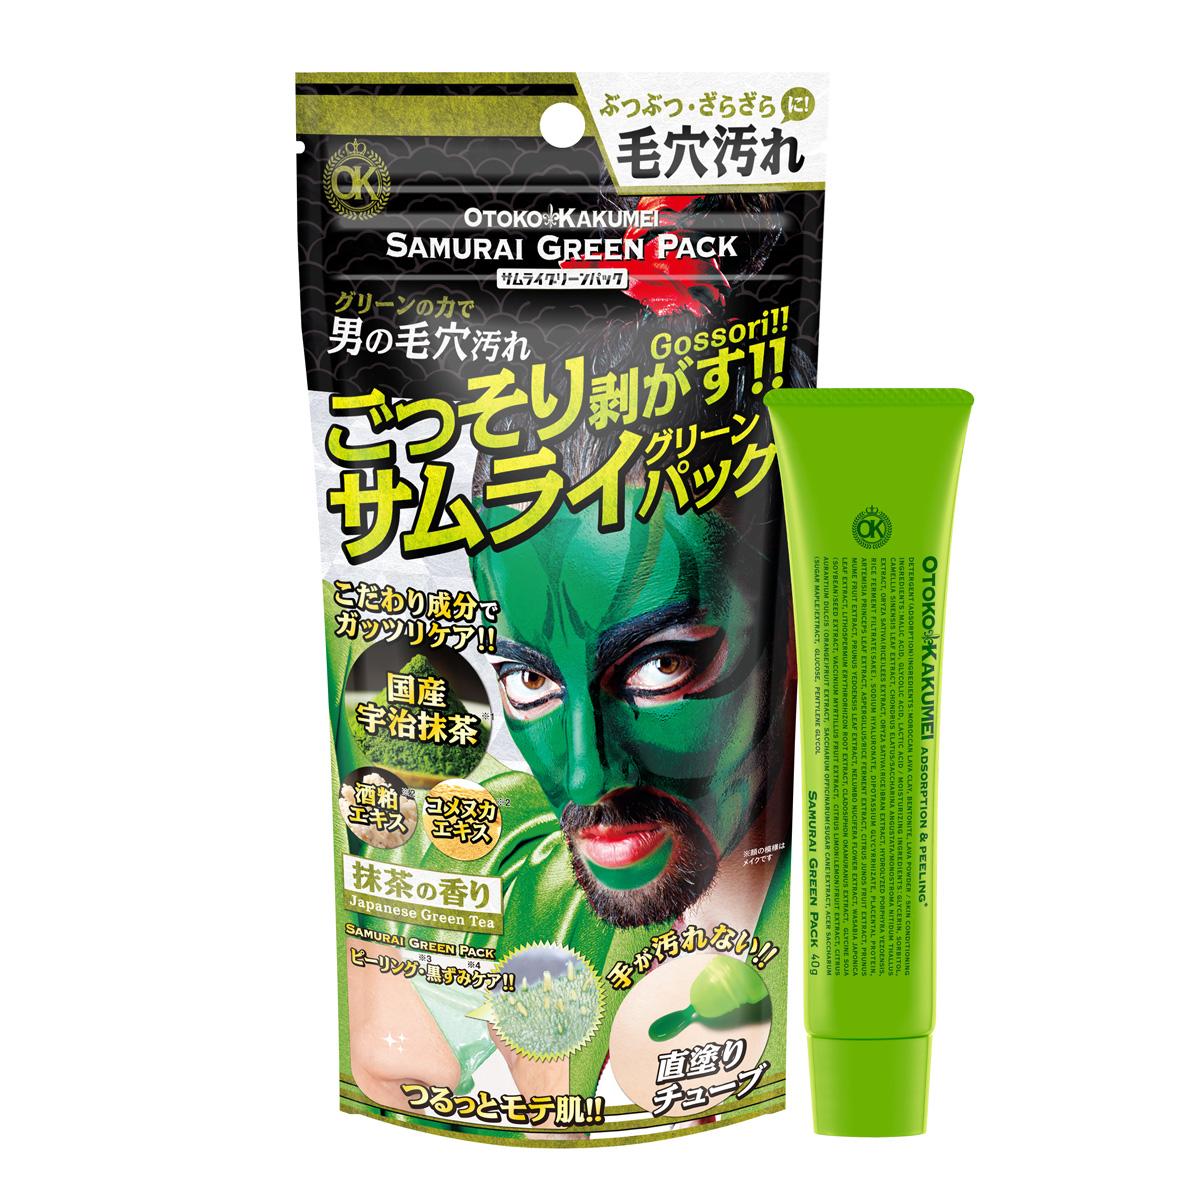 OKサムライグリーン直塗りパック【炭パック・メンズ顔用】